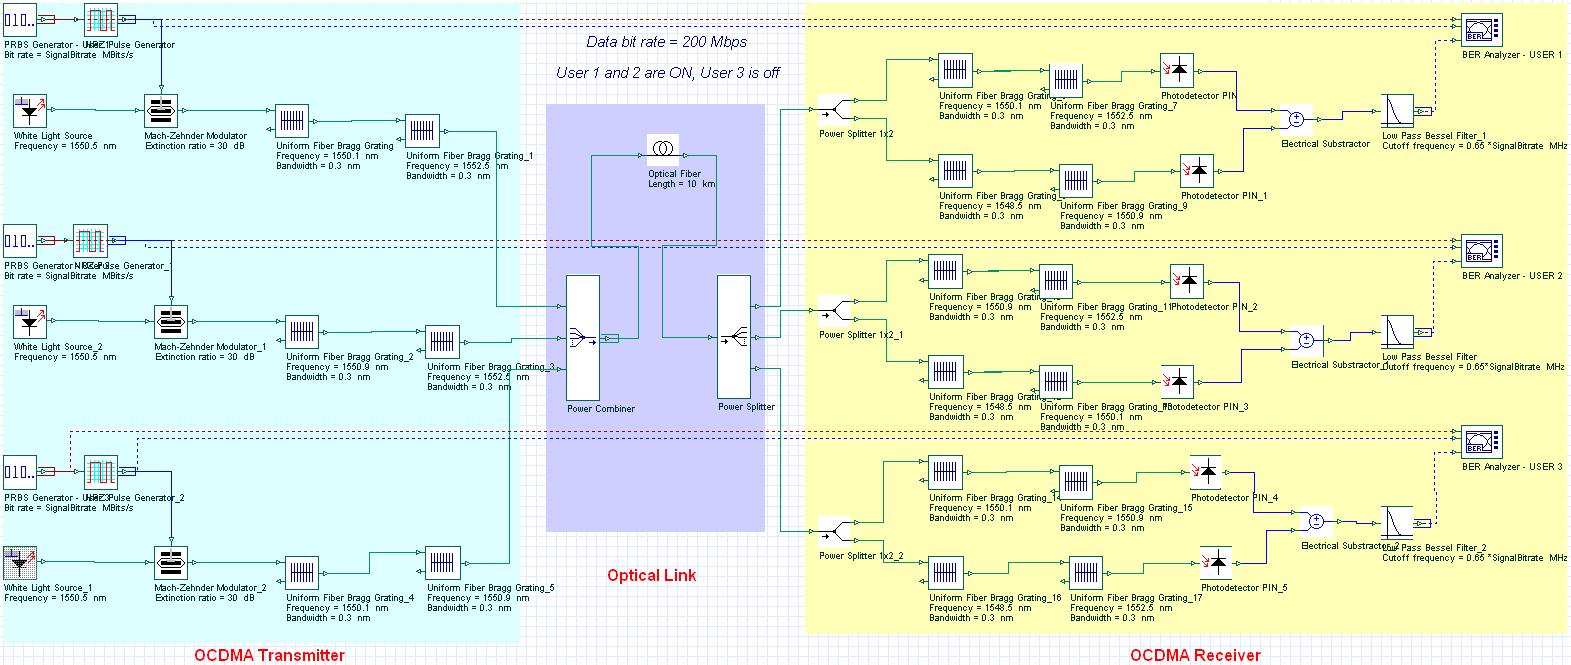 FTTH: OCDMA Network Layout